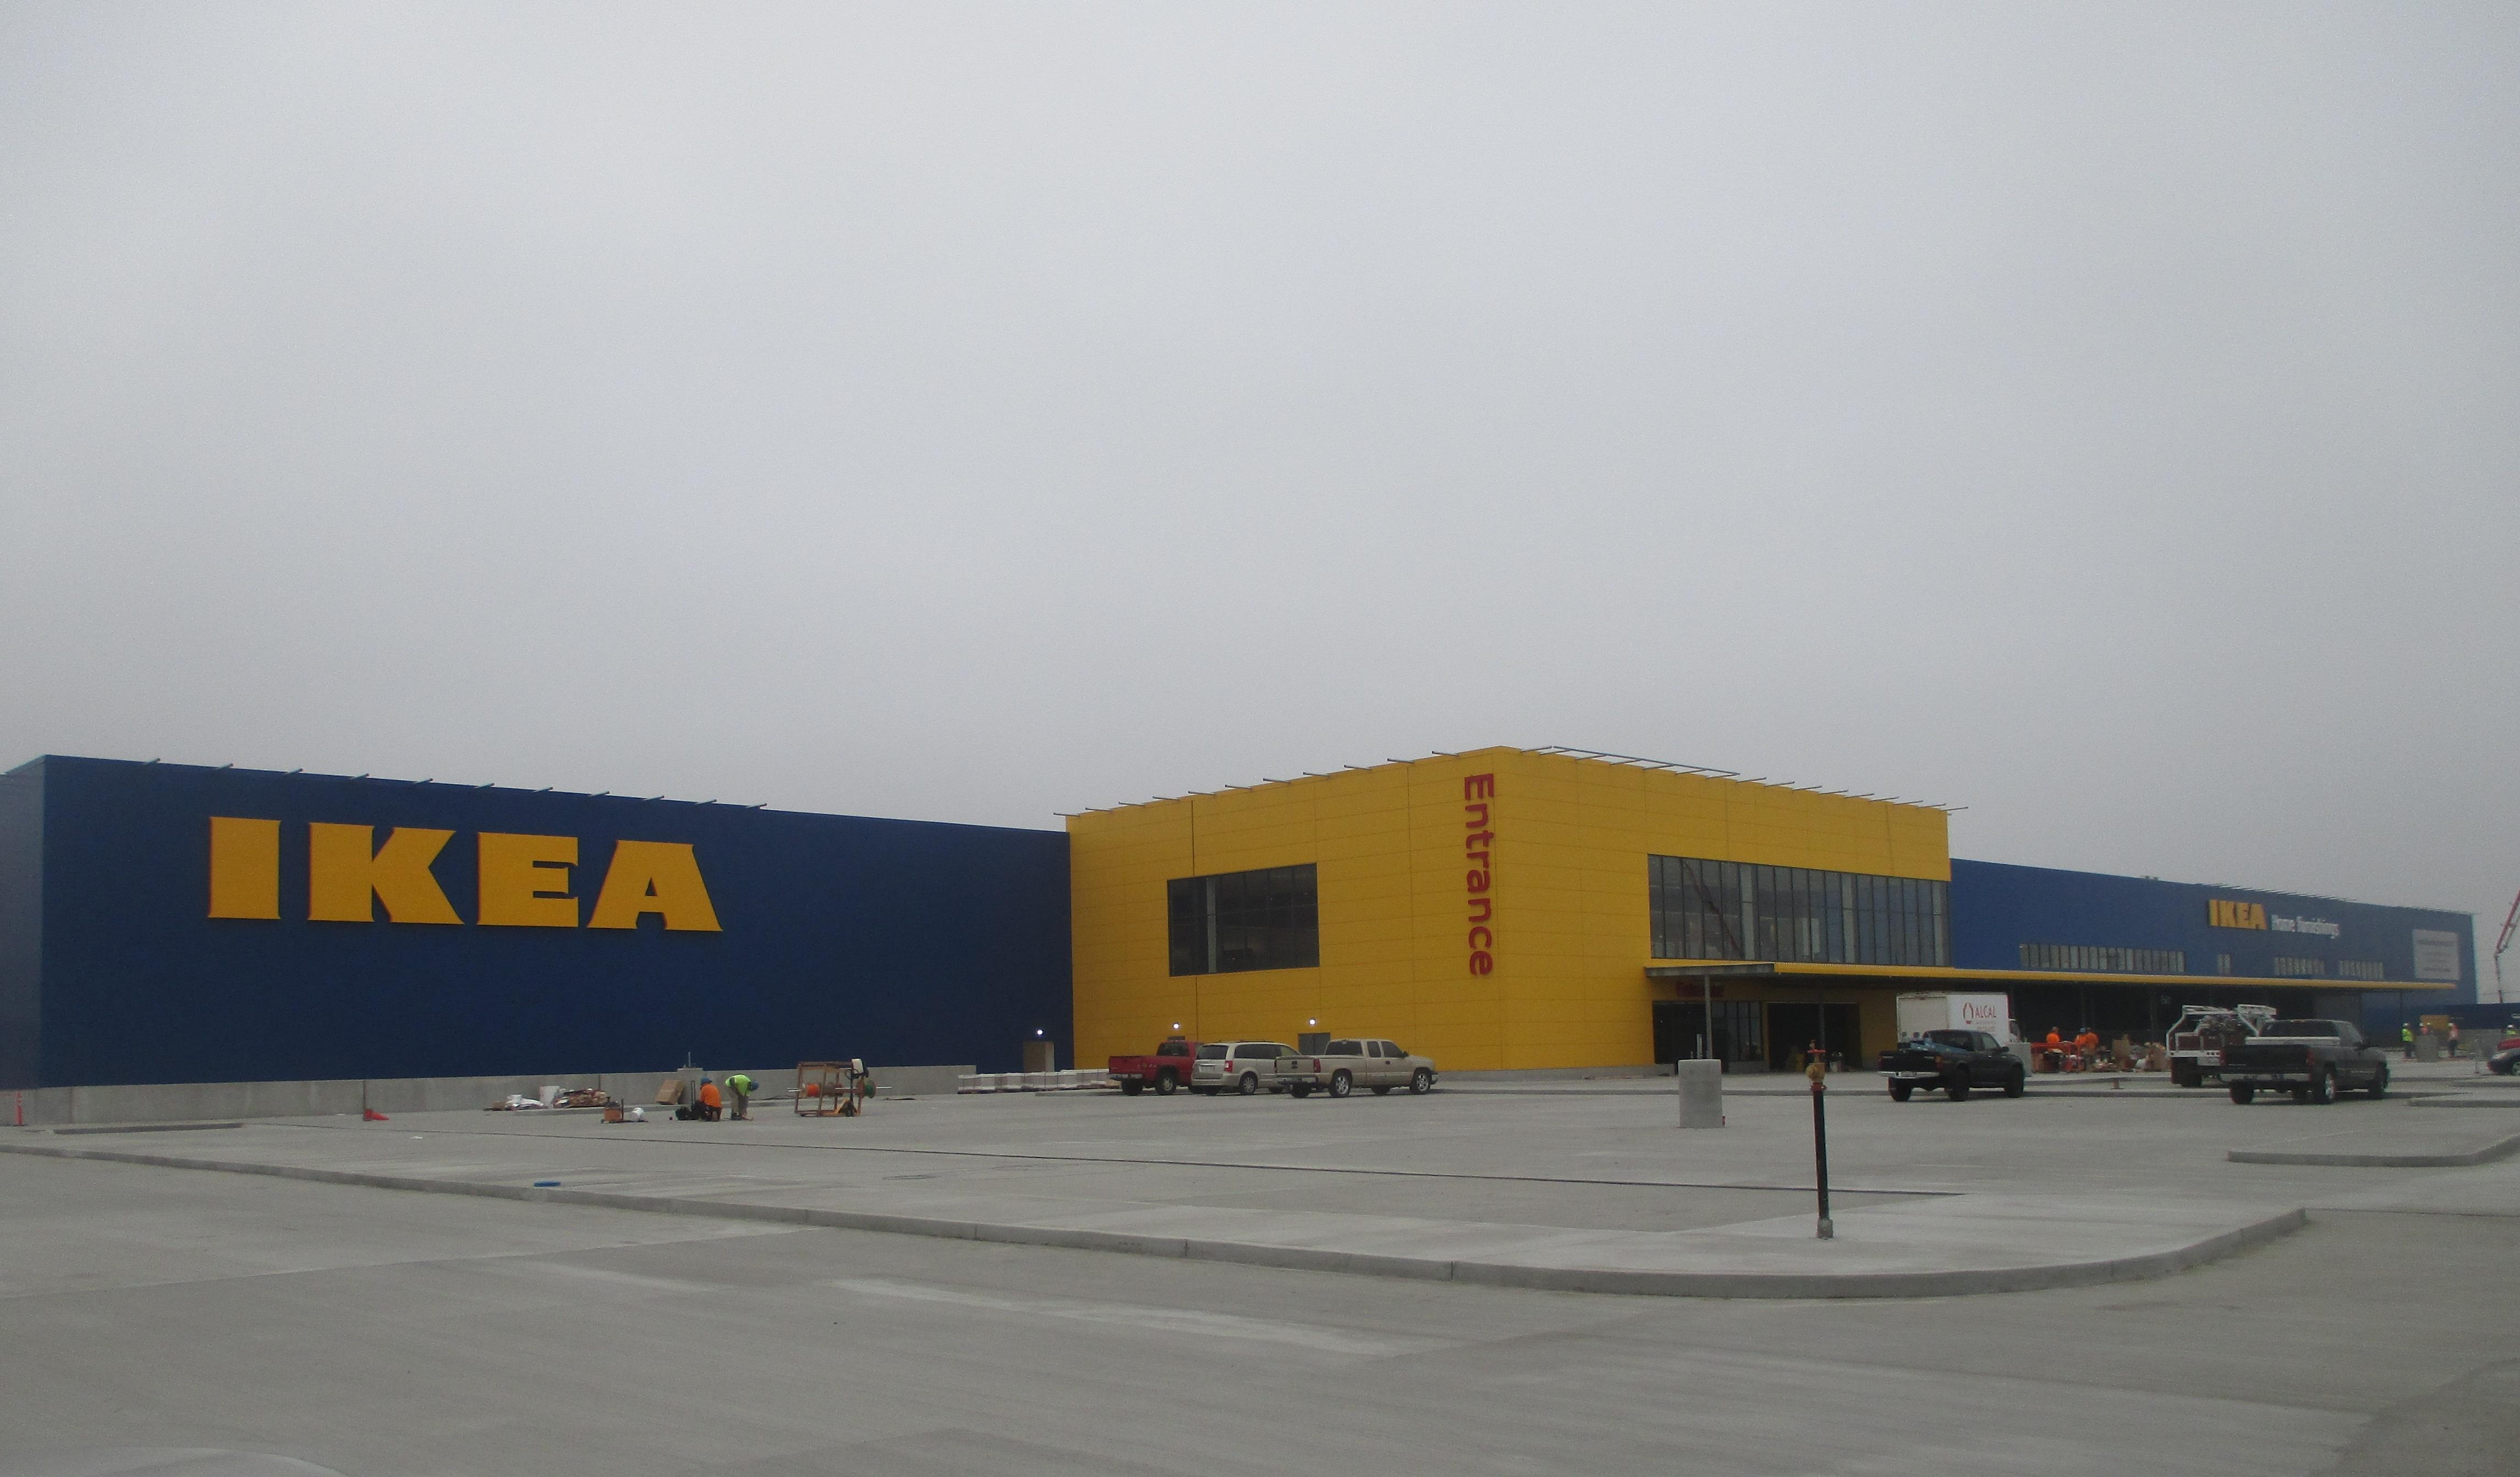 New Ger Ikea Burbank To Open